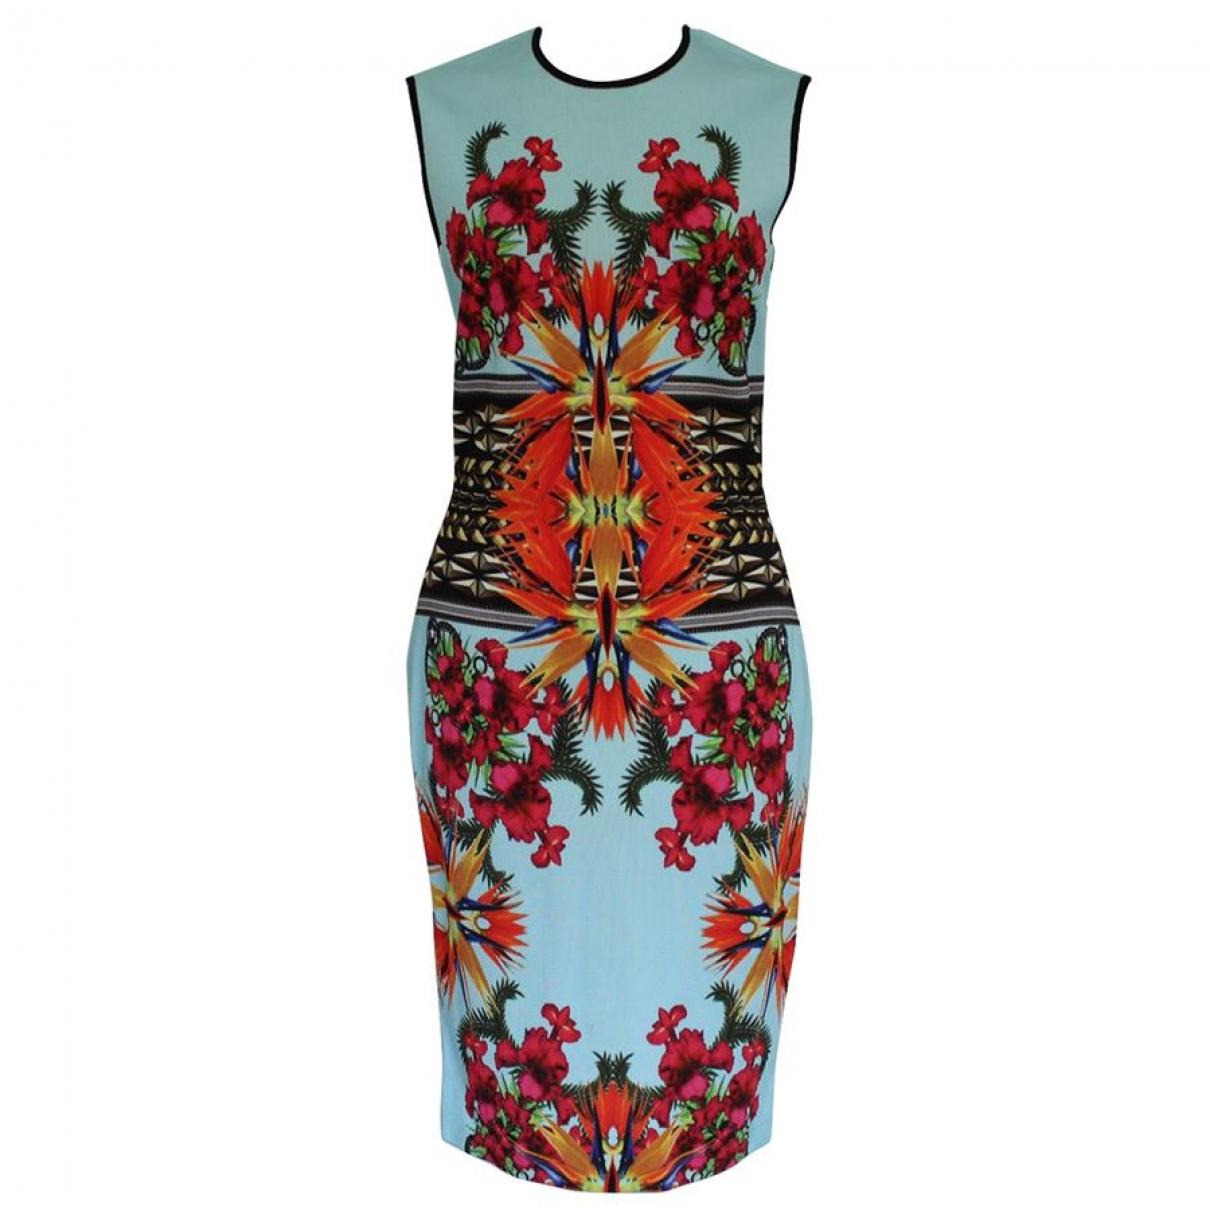 Givenchy \N Kleid in  Bunt Viskose